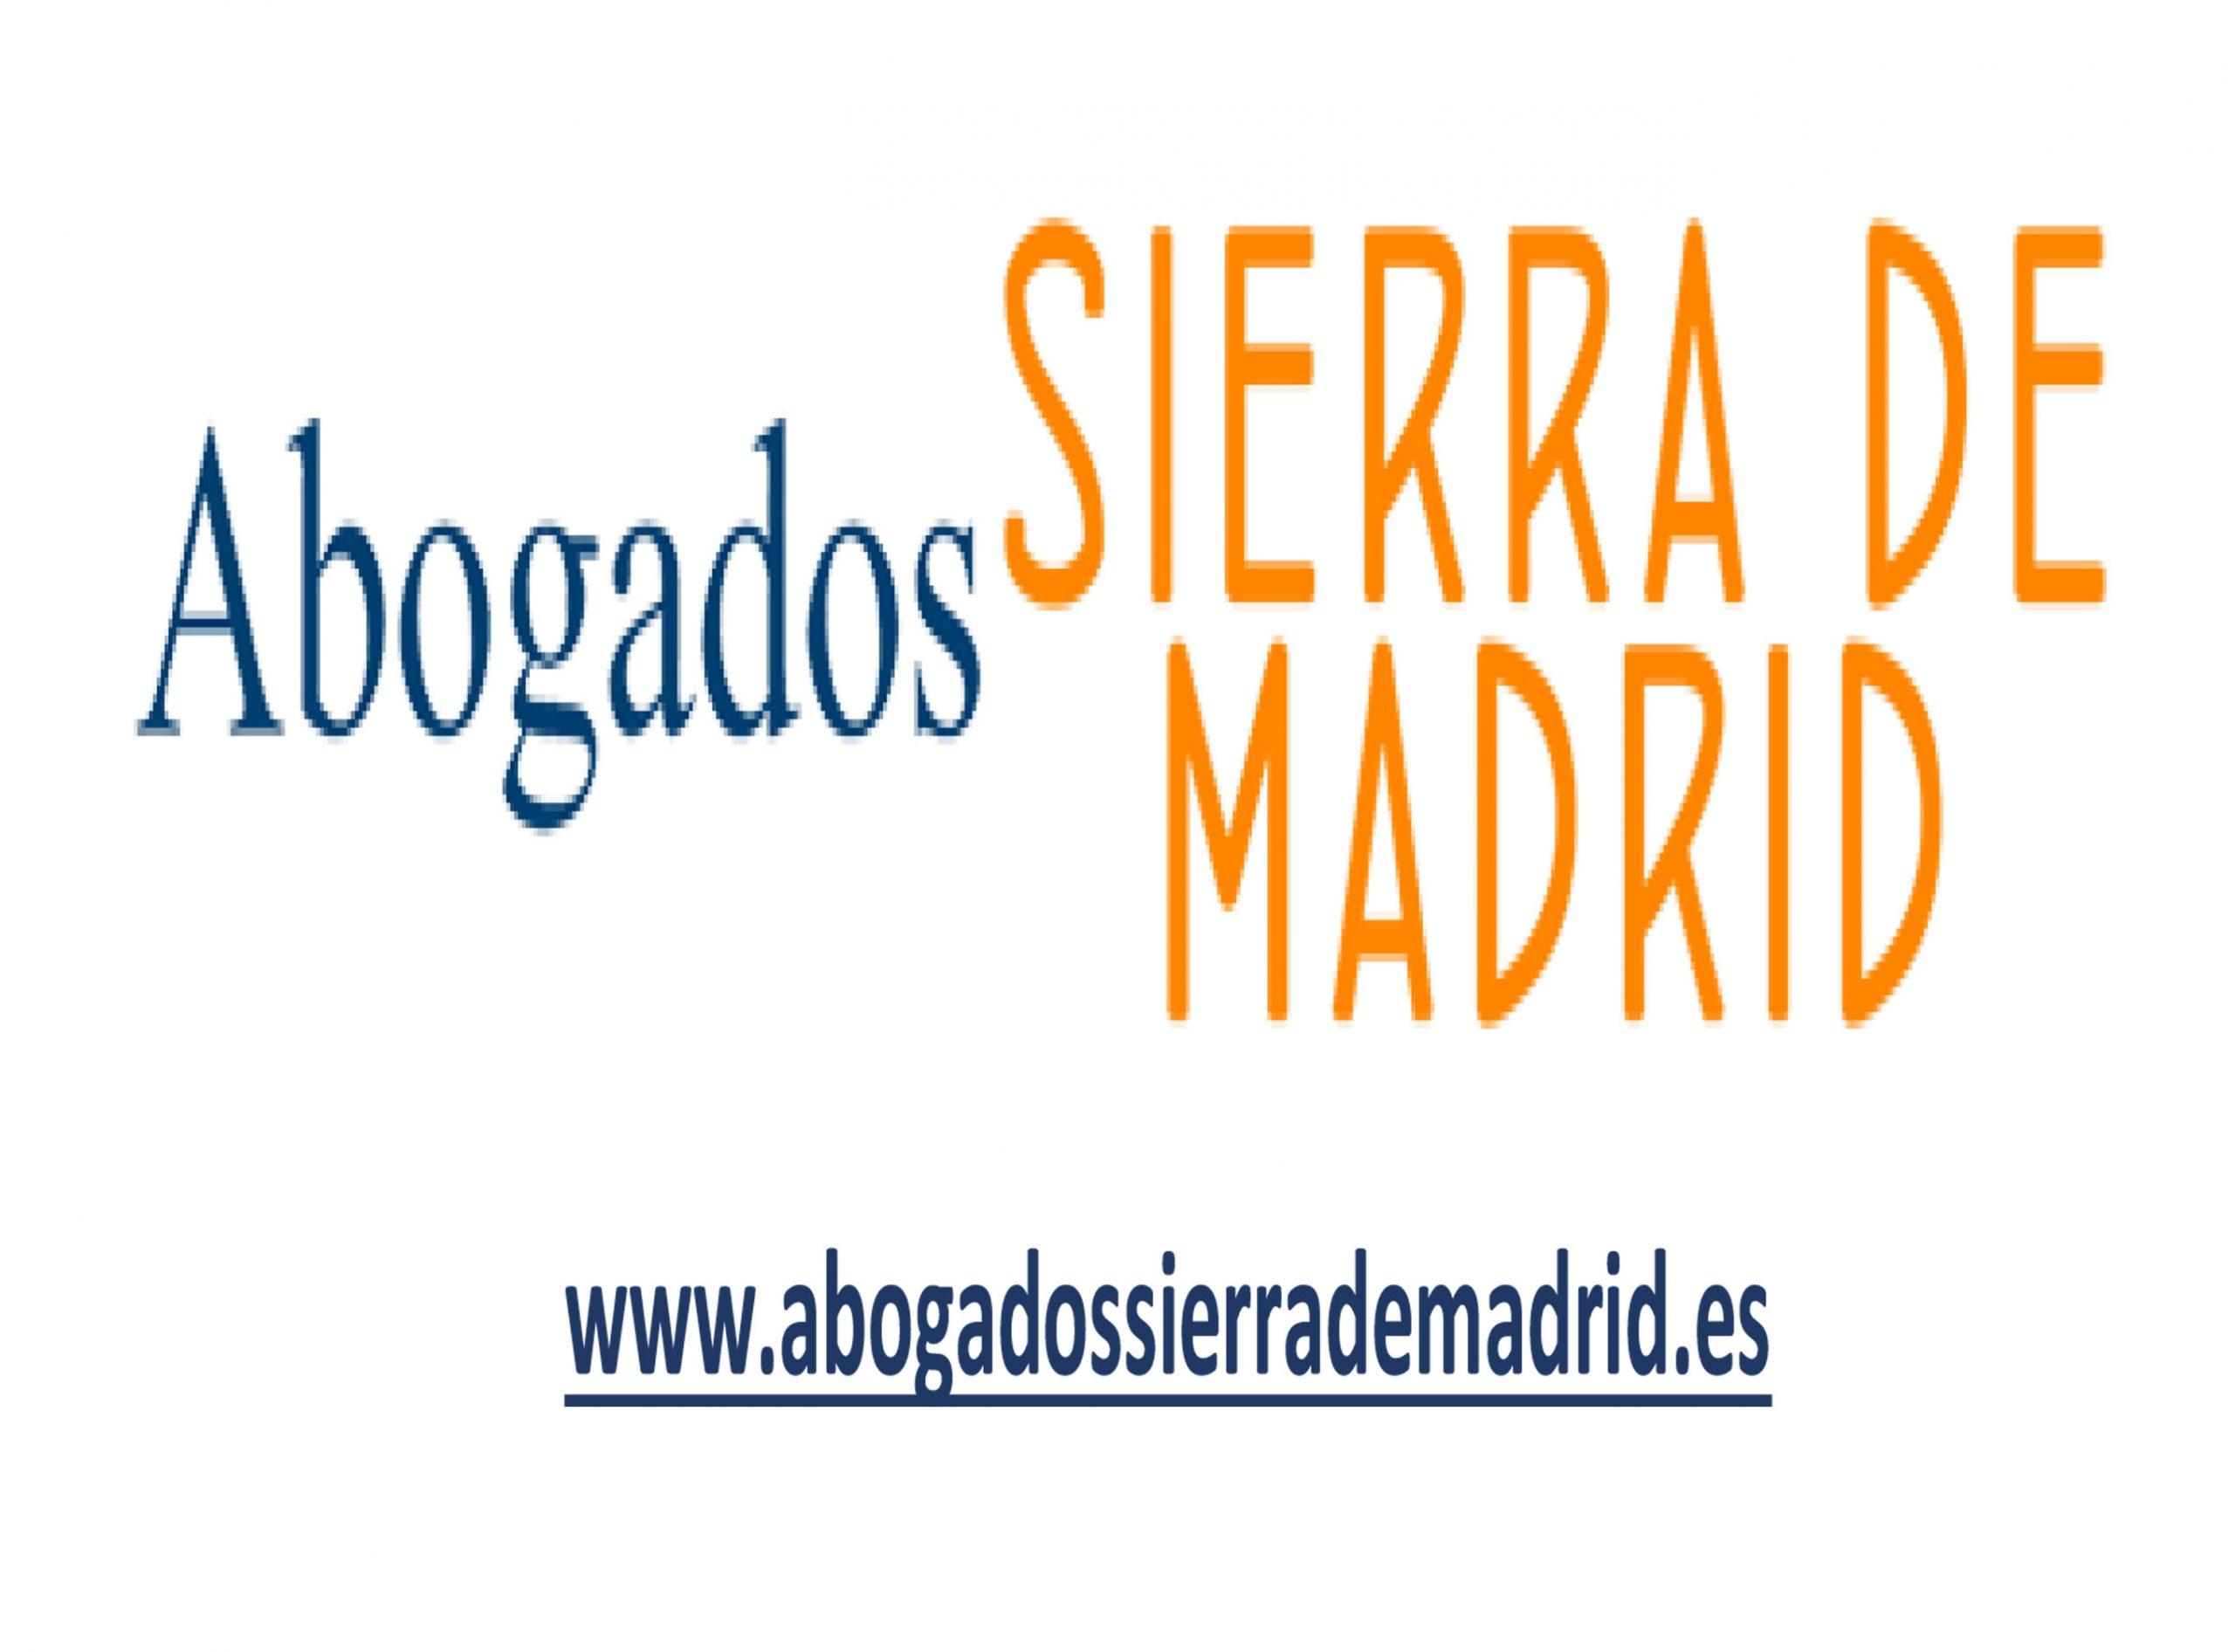 logo Abogados Sierra de Madrid_web